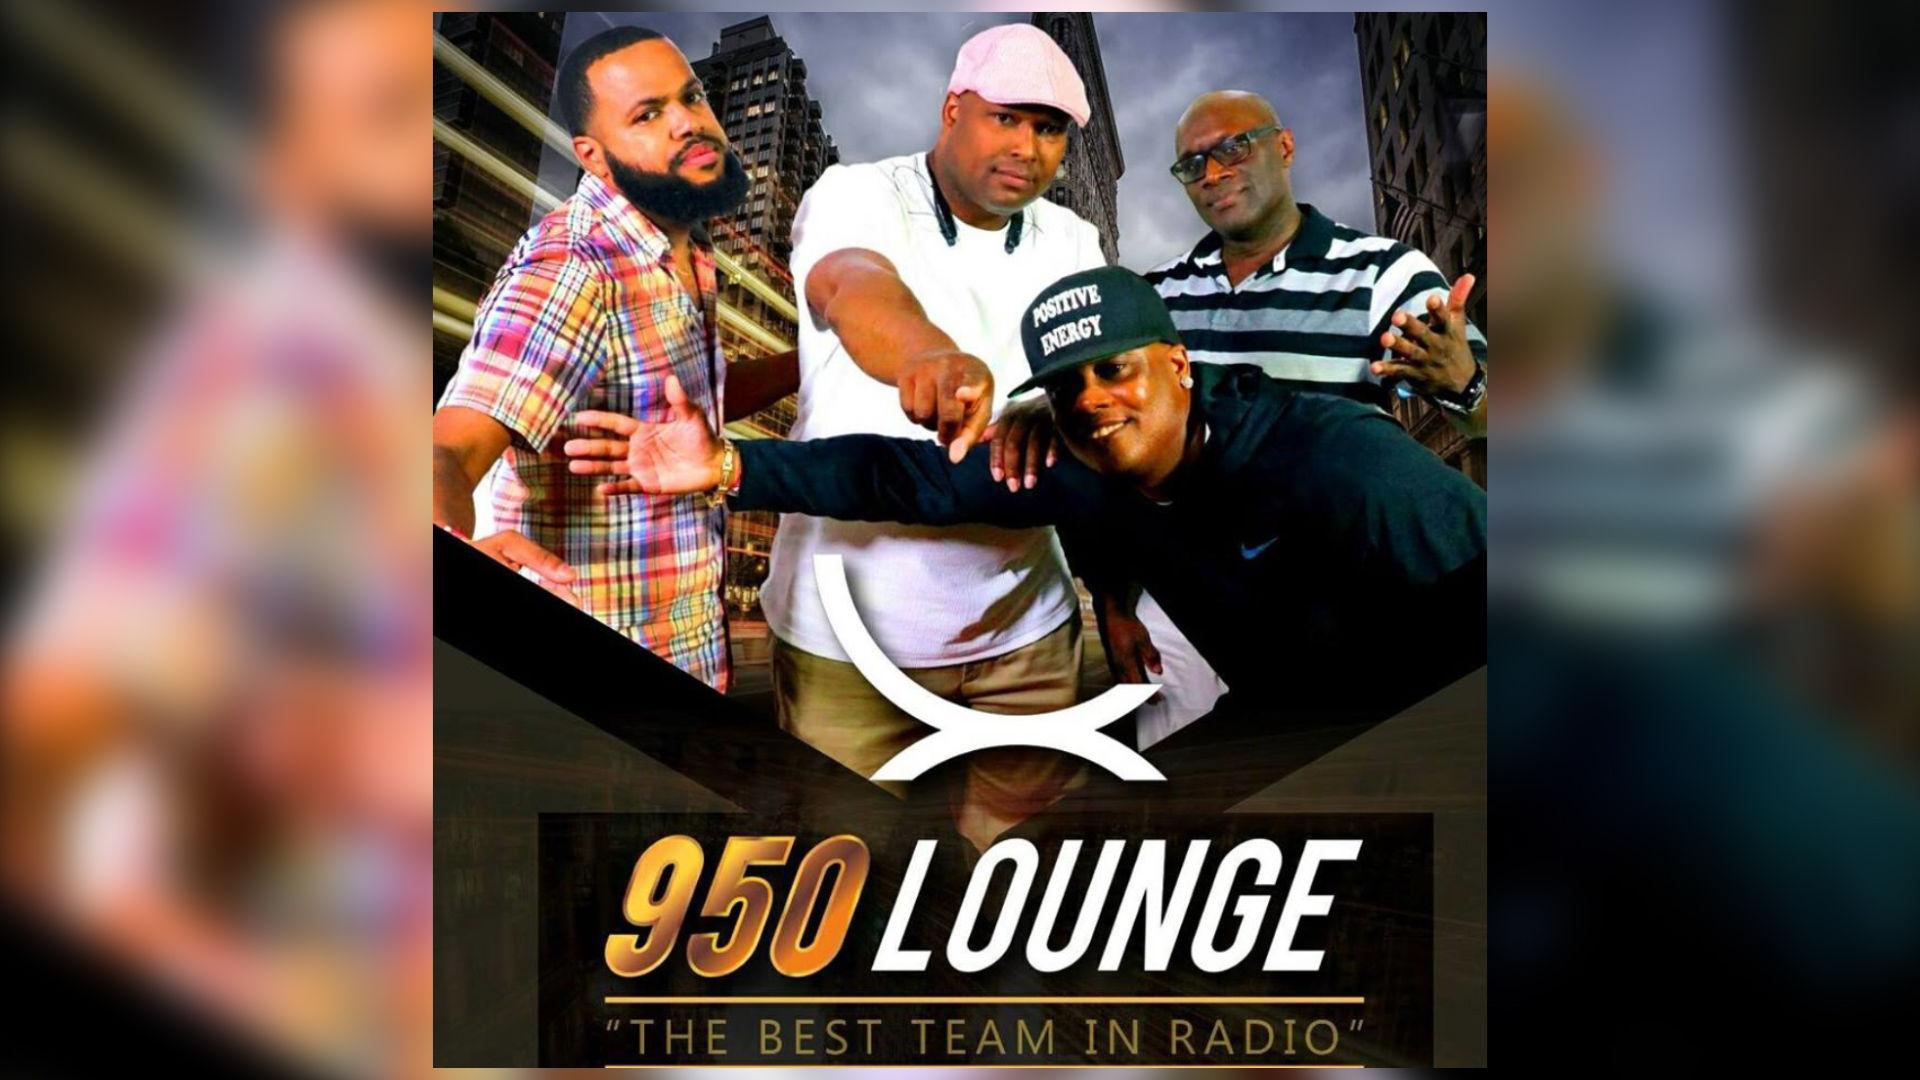 Cafe Con Leche Ep. 306 at 950 Lounge Radio (Promo)